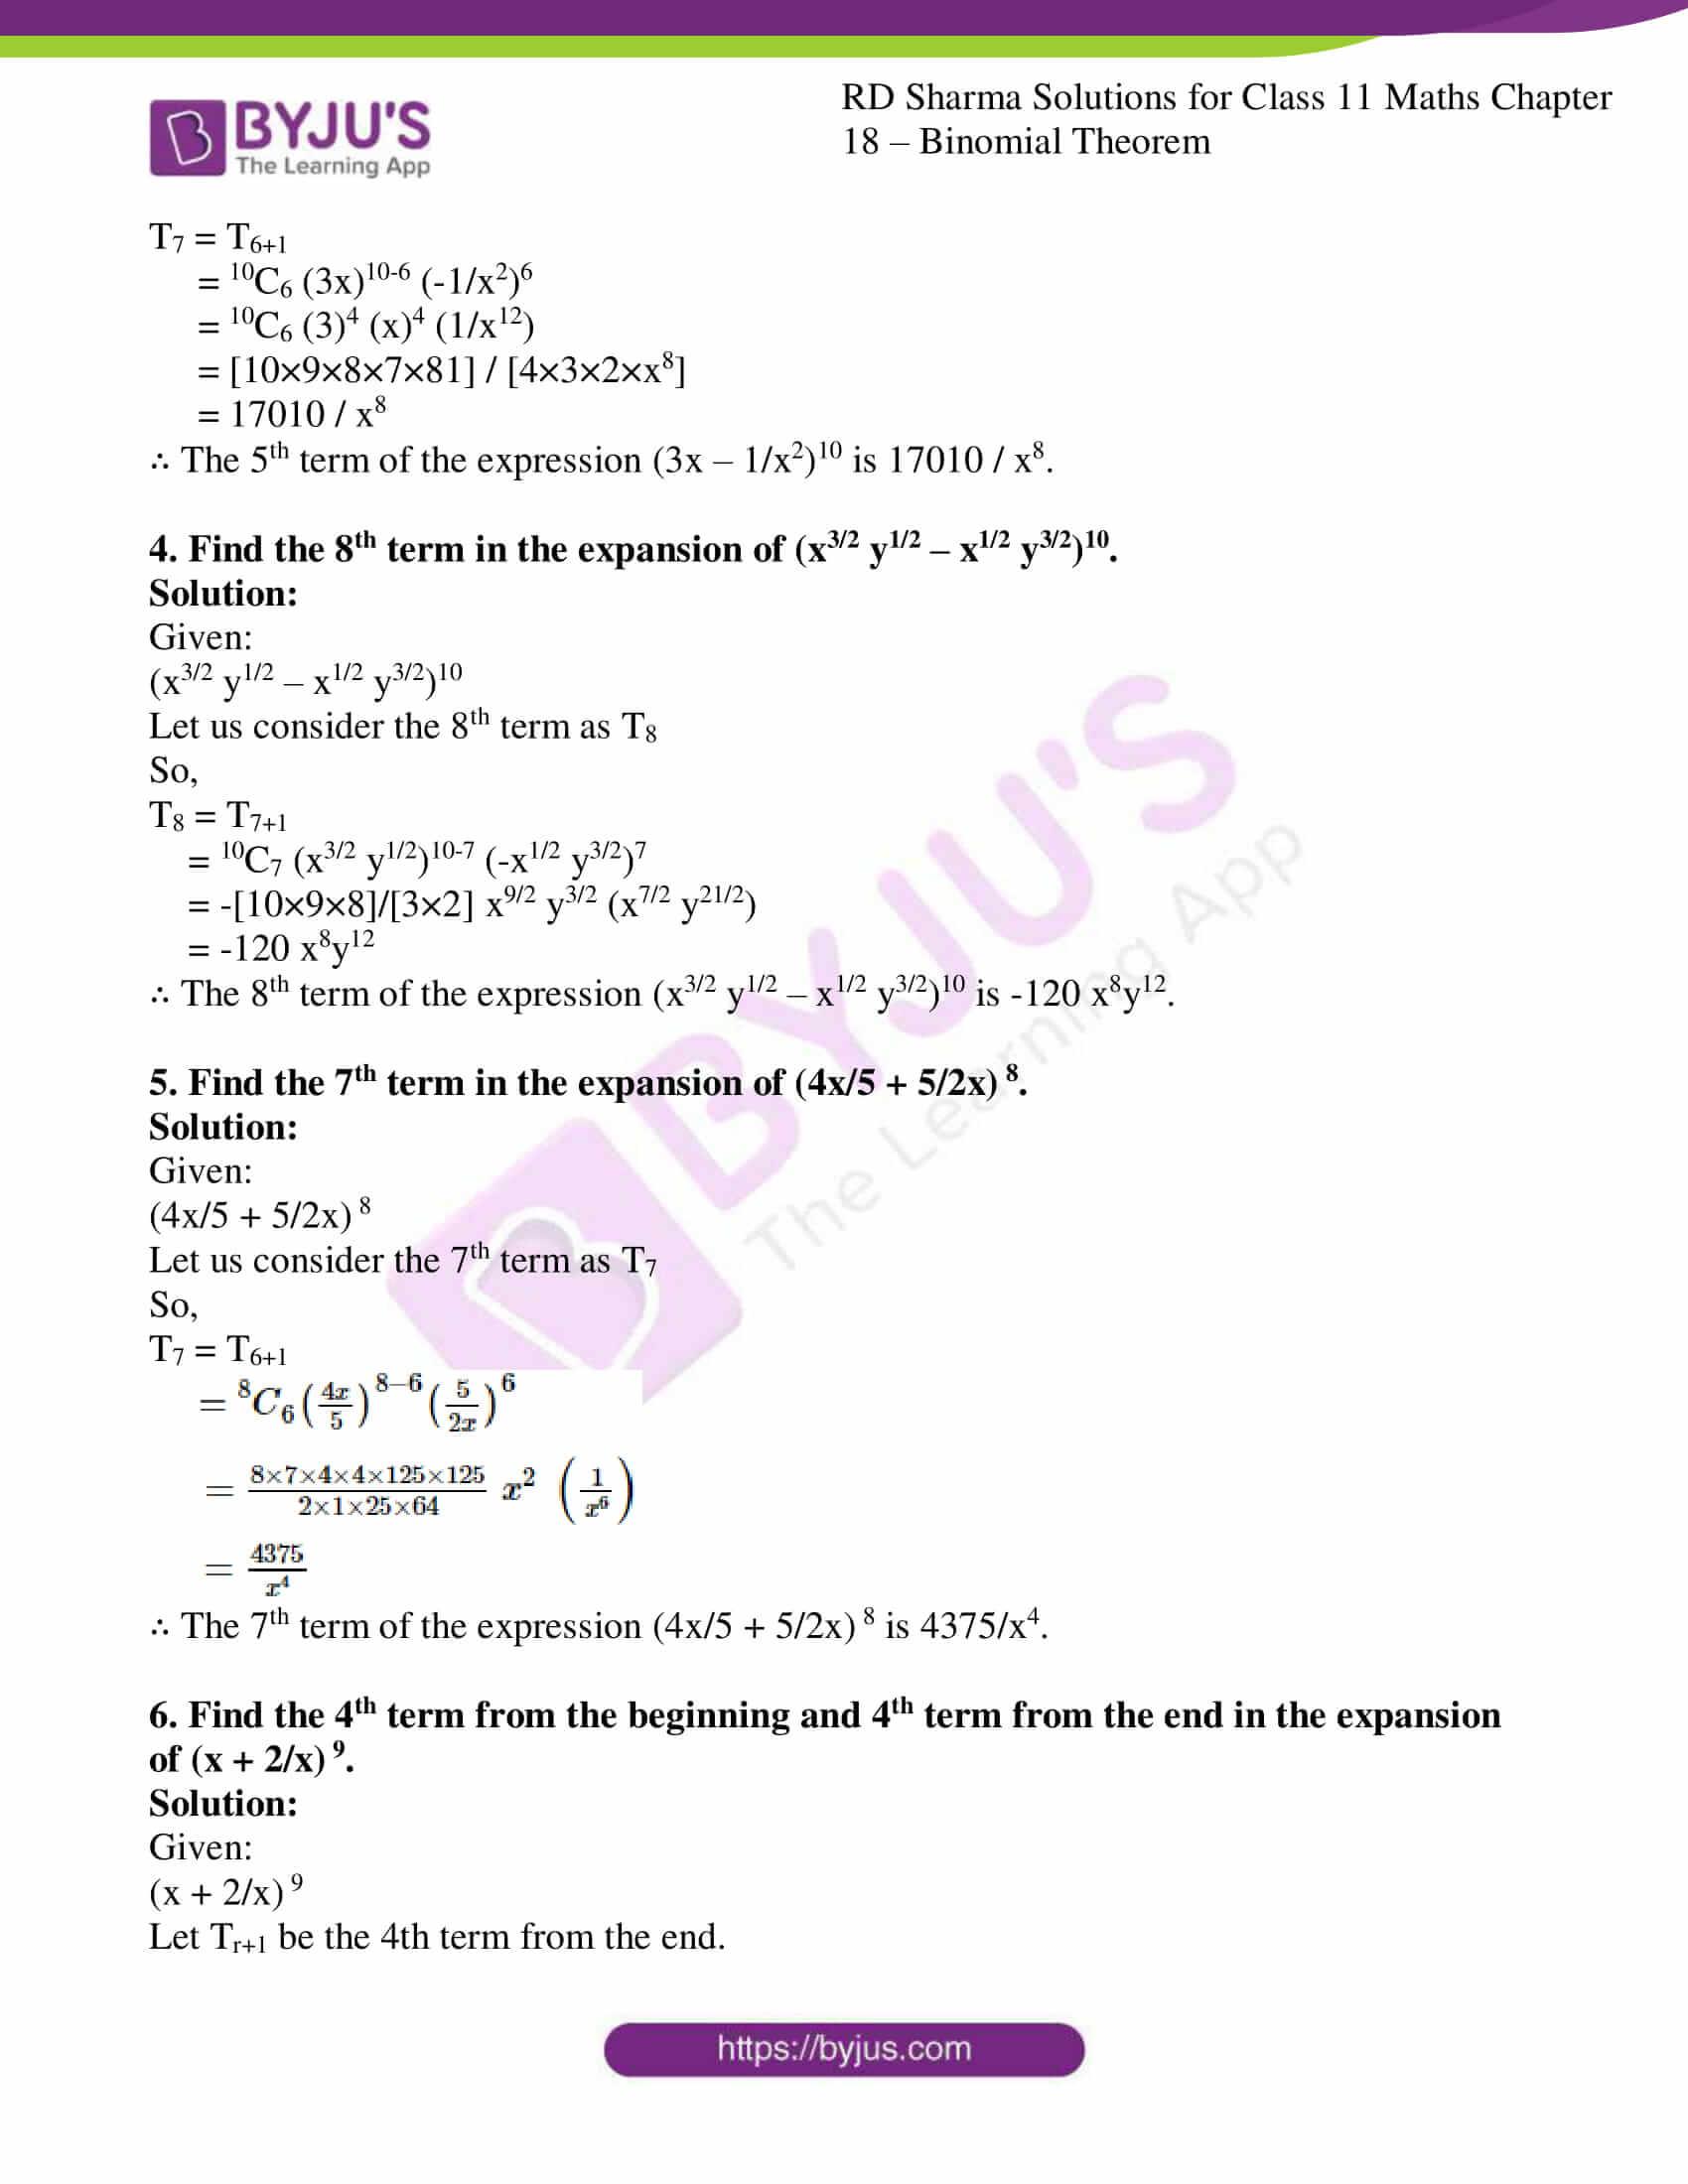 rd sharma class 11 maths ch 18 ex 2 02